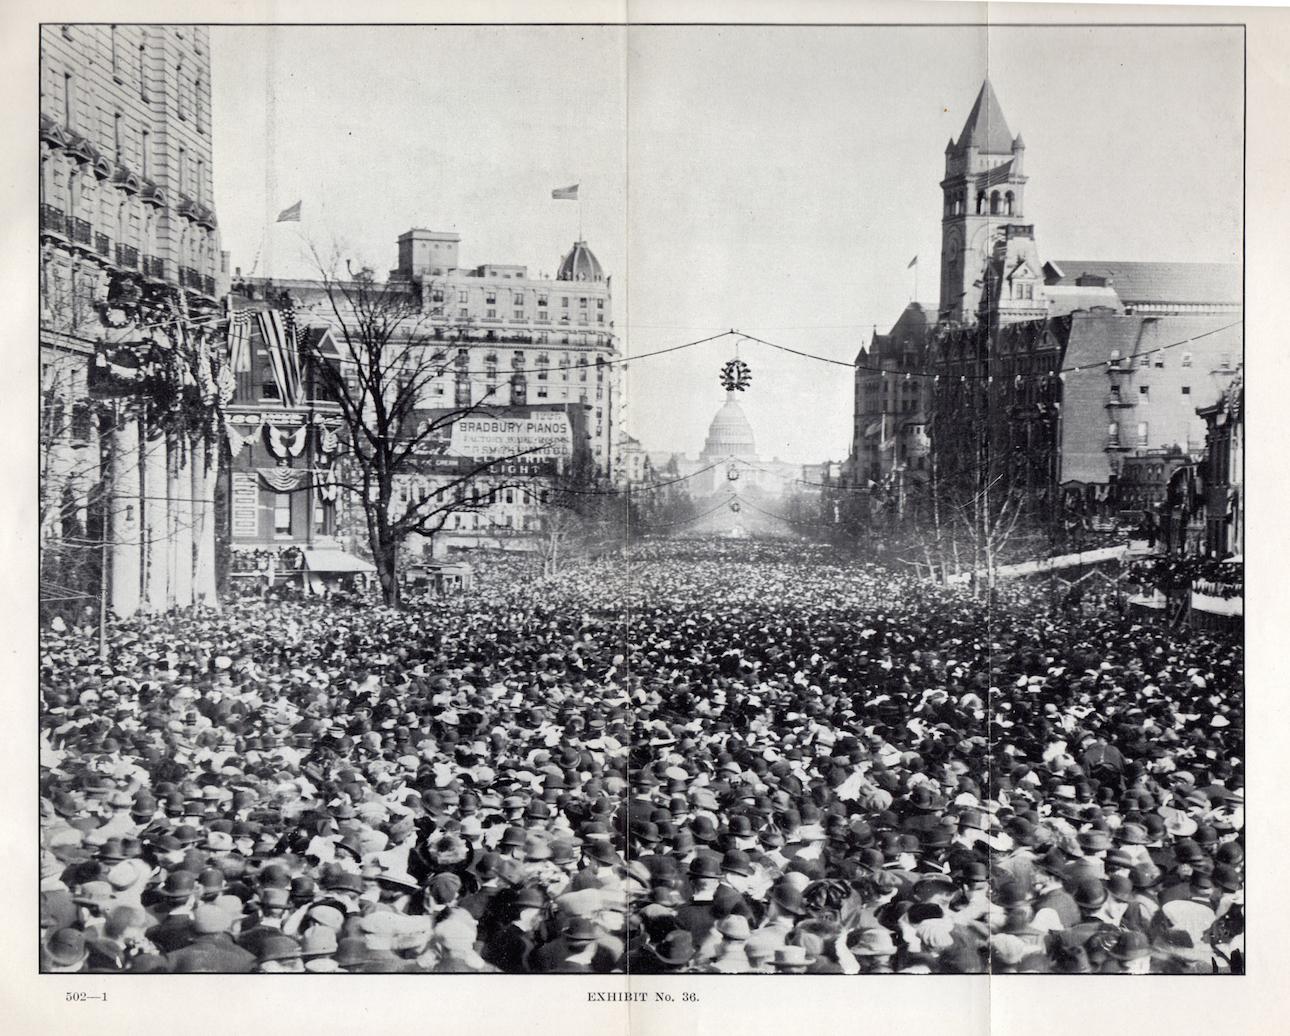 Woman Suffrage Procession, March 3, 1913